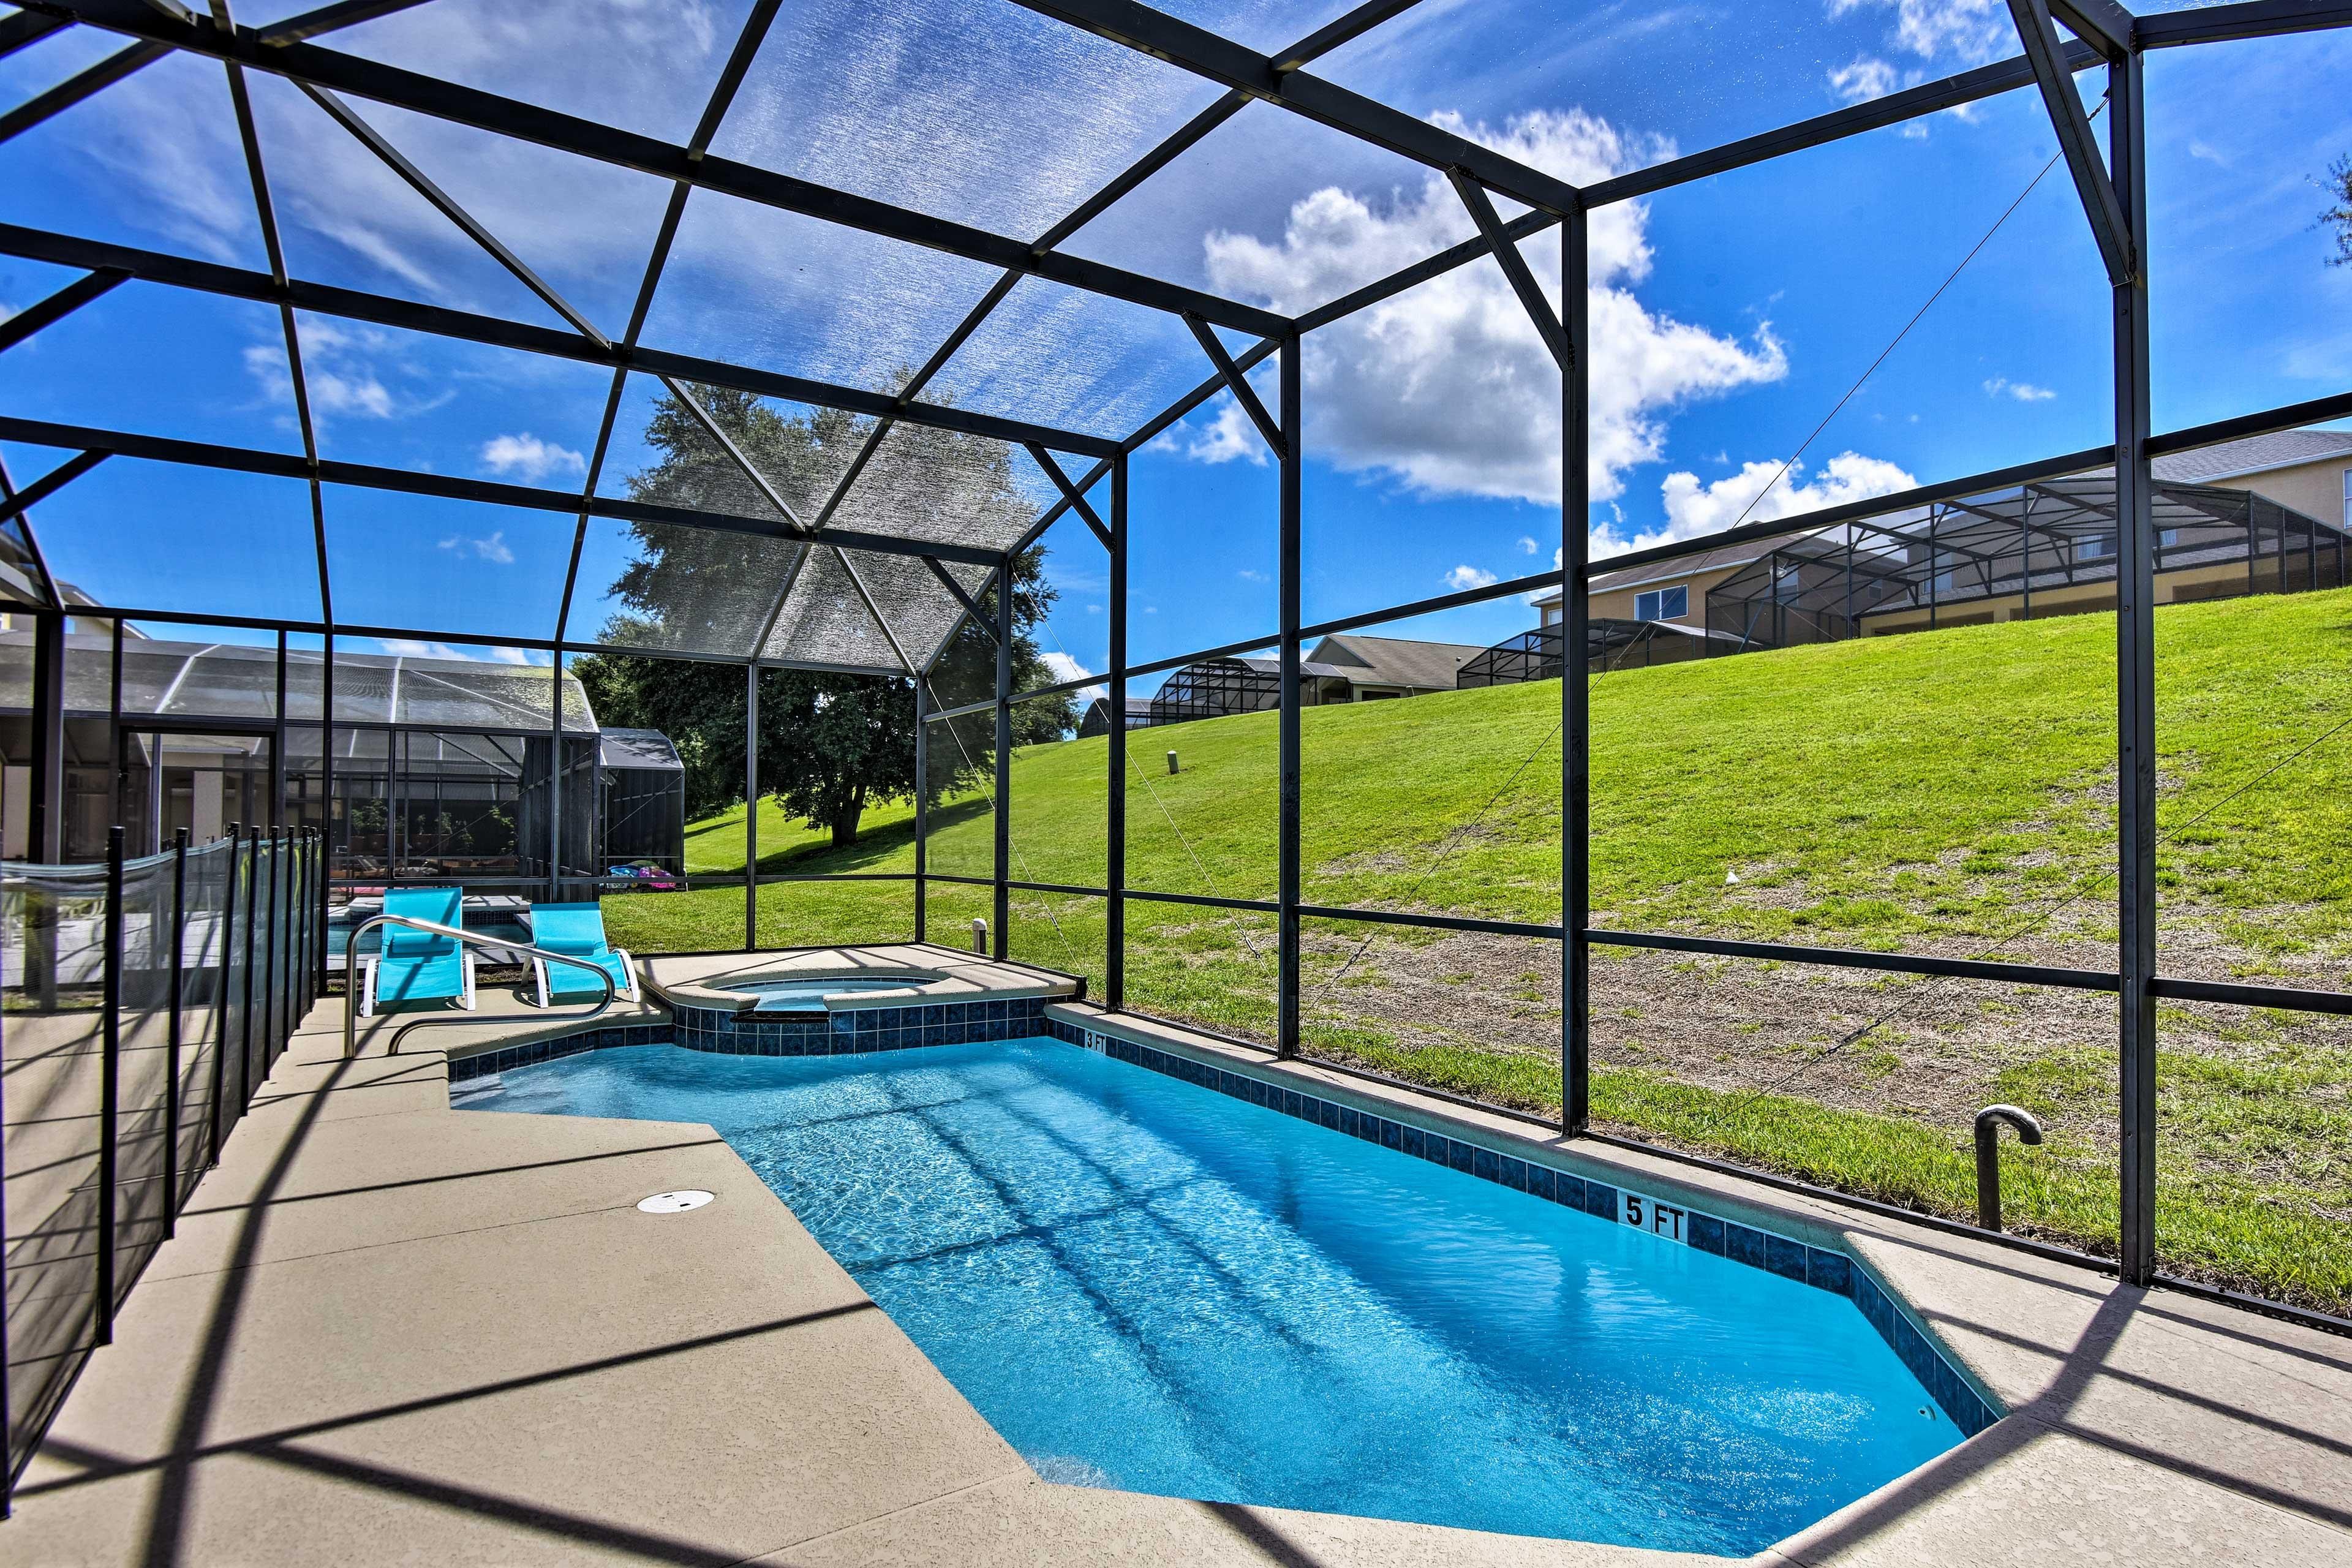 Take a refreshing dip in the pool.